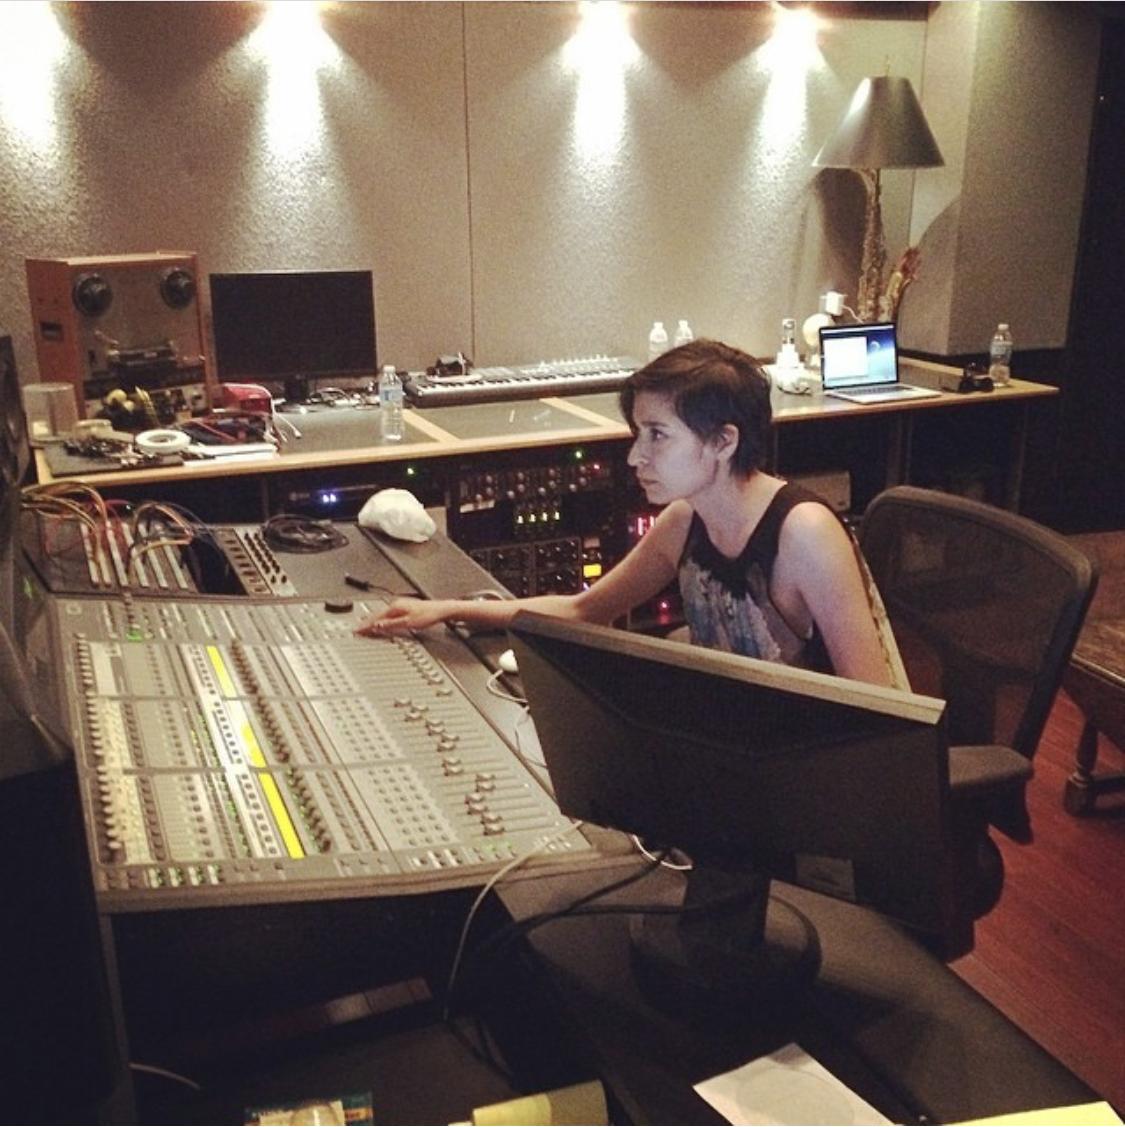 Defoe music engineer producer composer